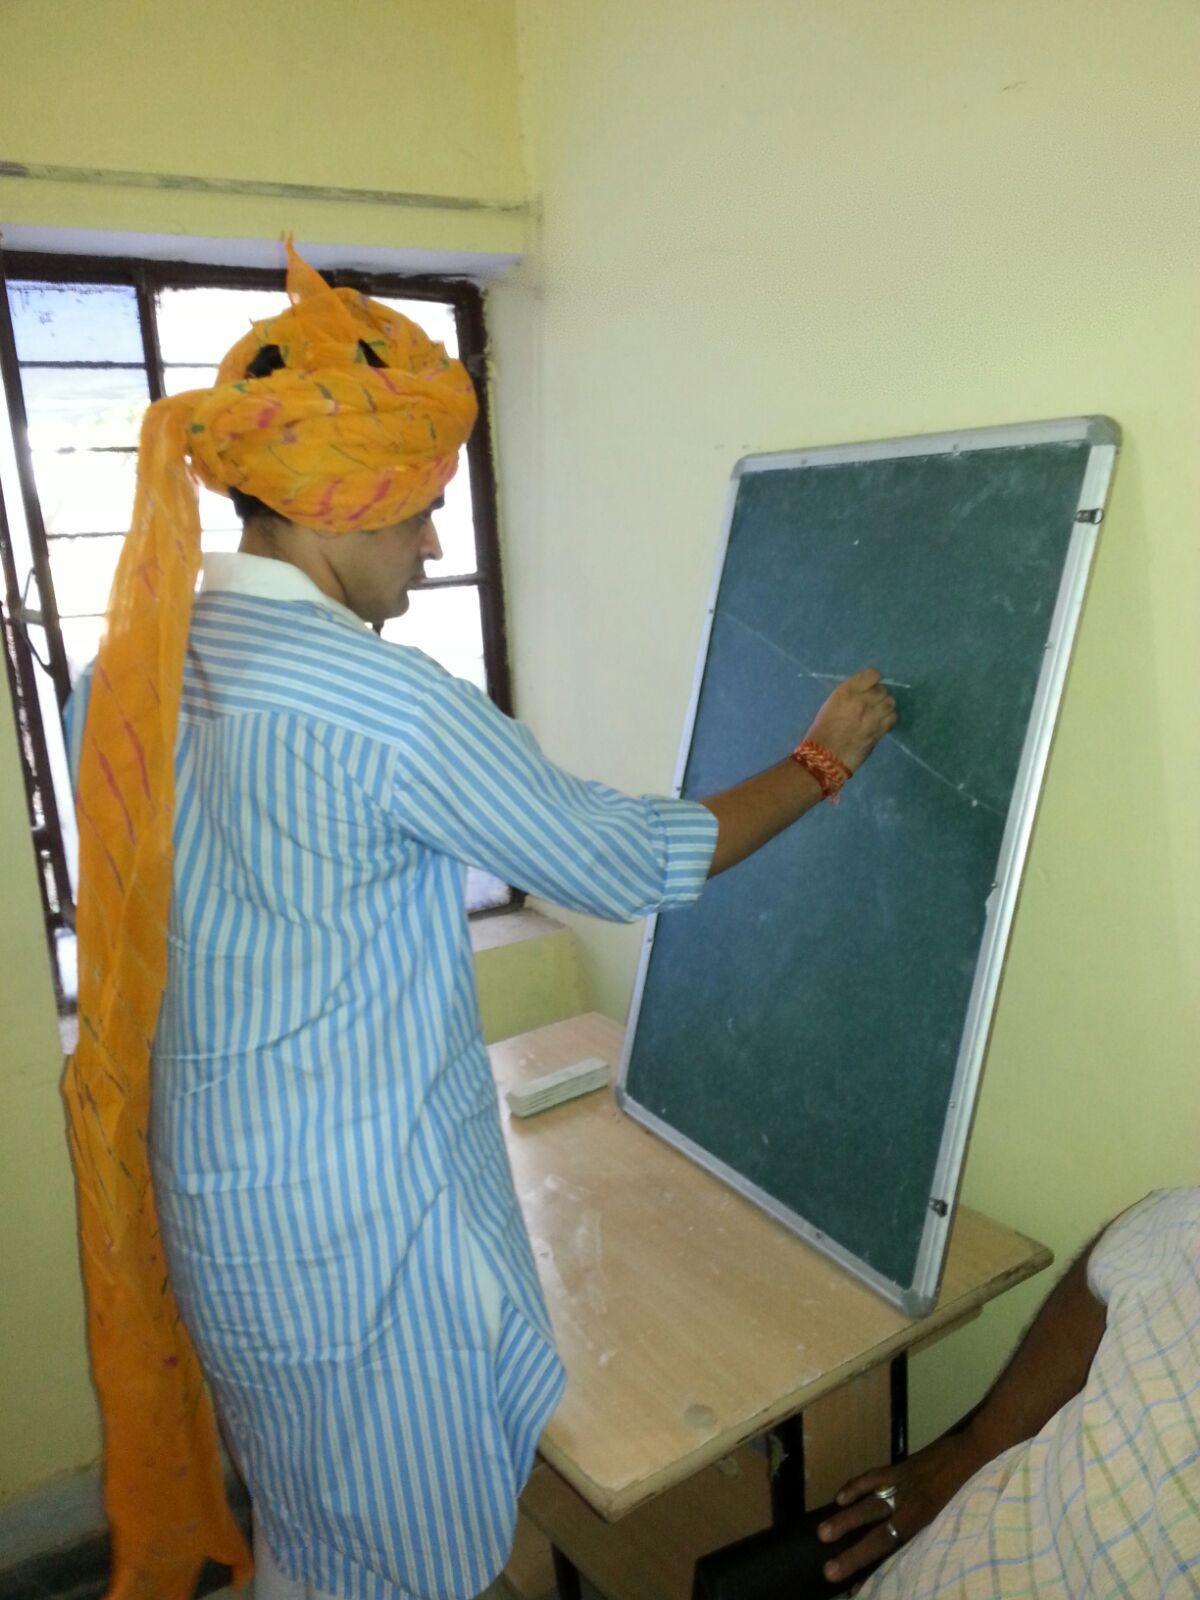 Karauli, Rajasthan Social programs, Rajasthan, India